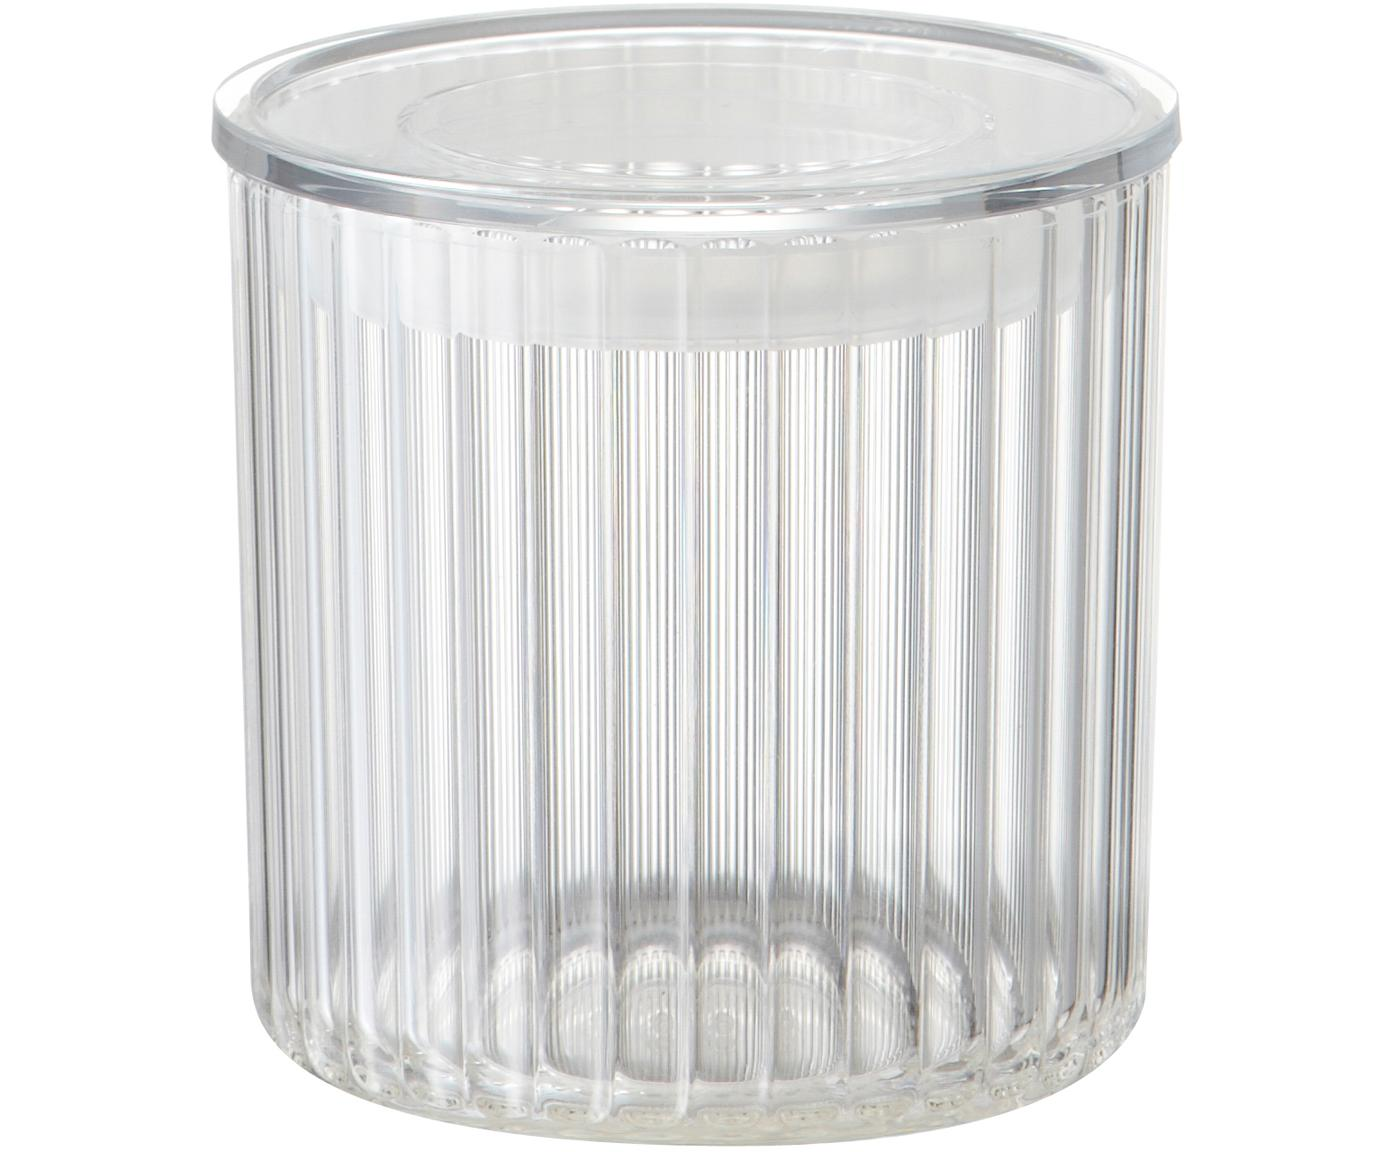 Bote de plástico Fonte, Plástico (PMS), Transparente, Ø 10 x Al 11 cm